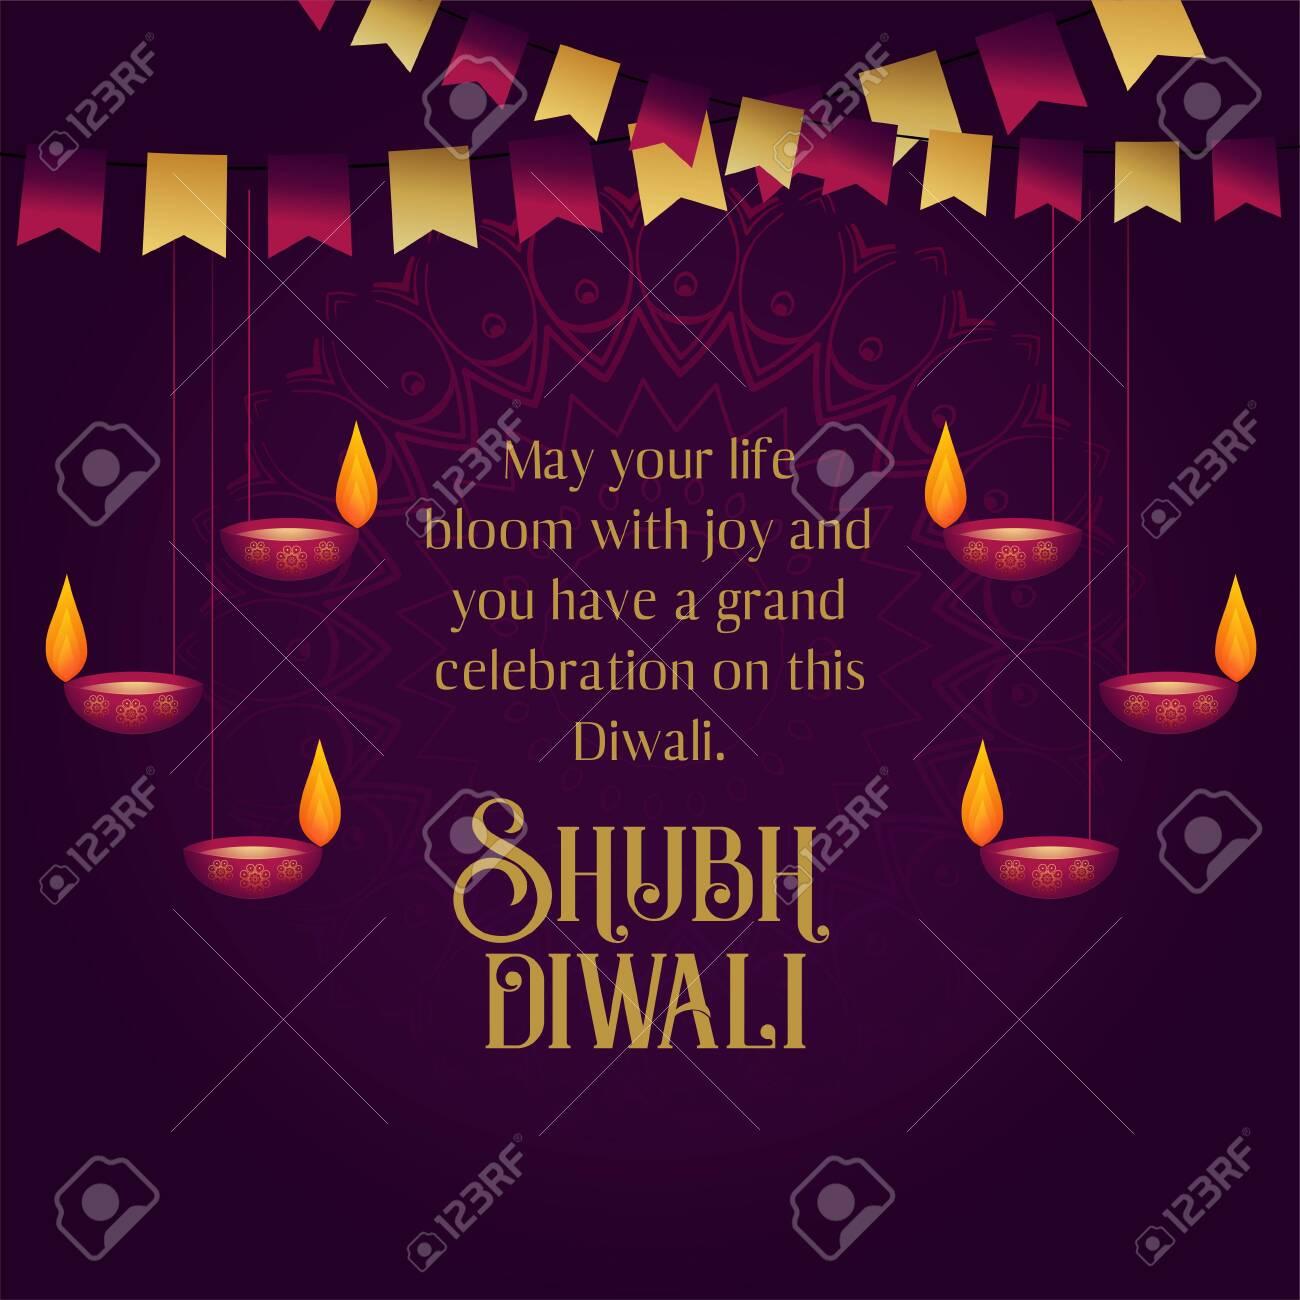 Creative Diwali Wishes Twitter thumbnail